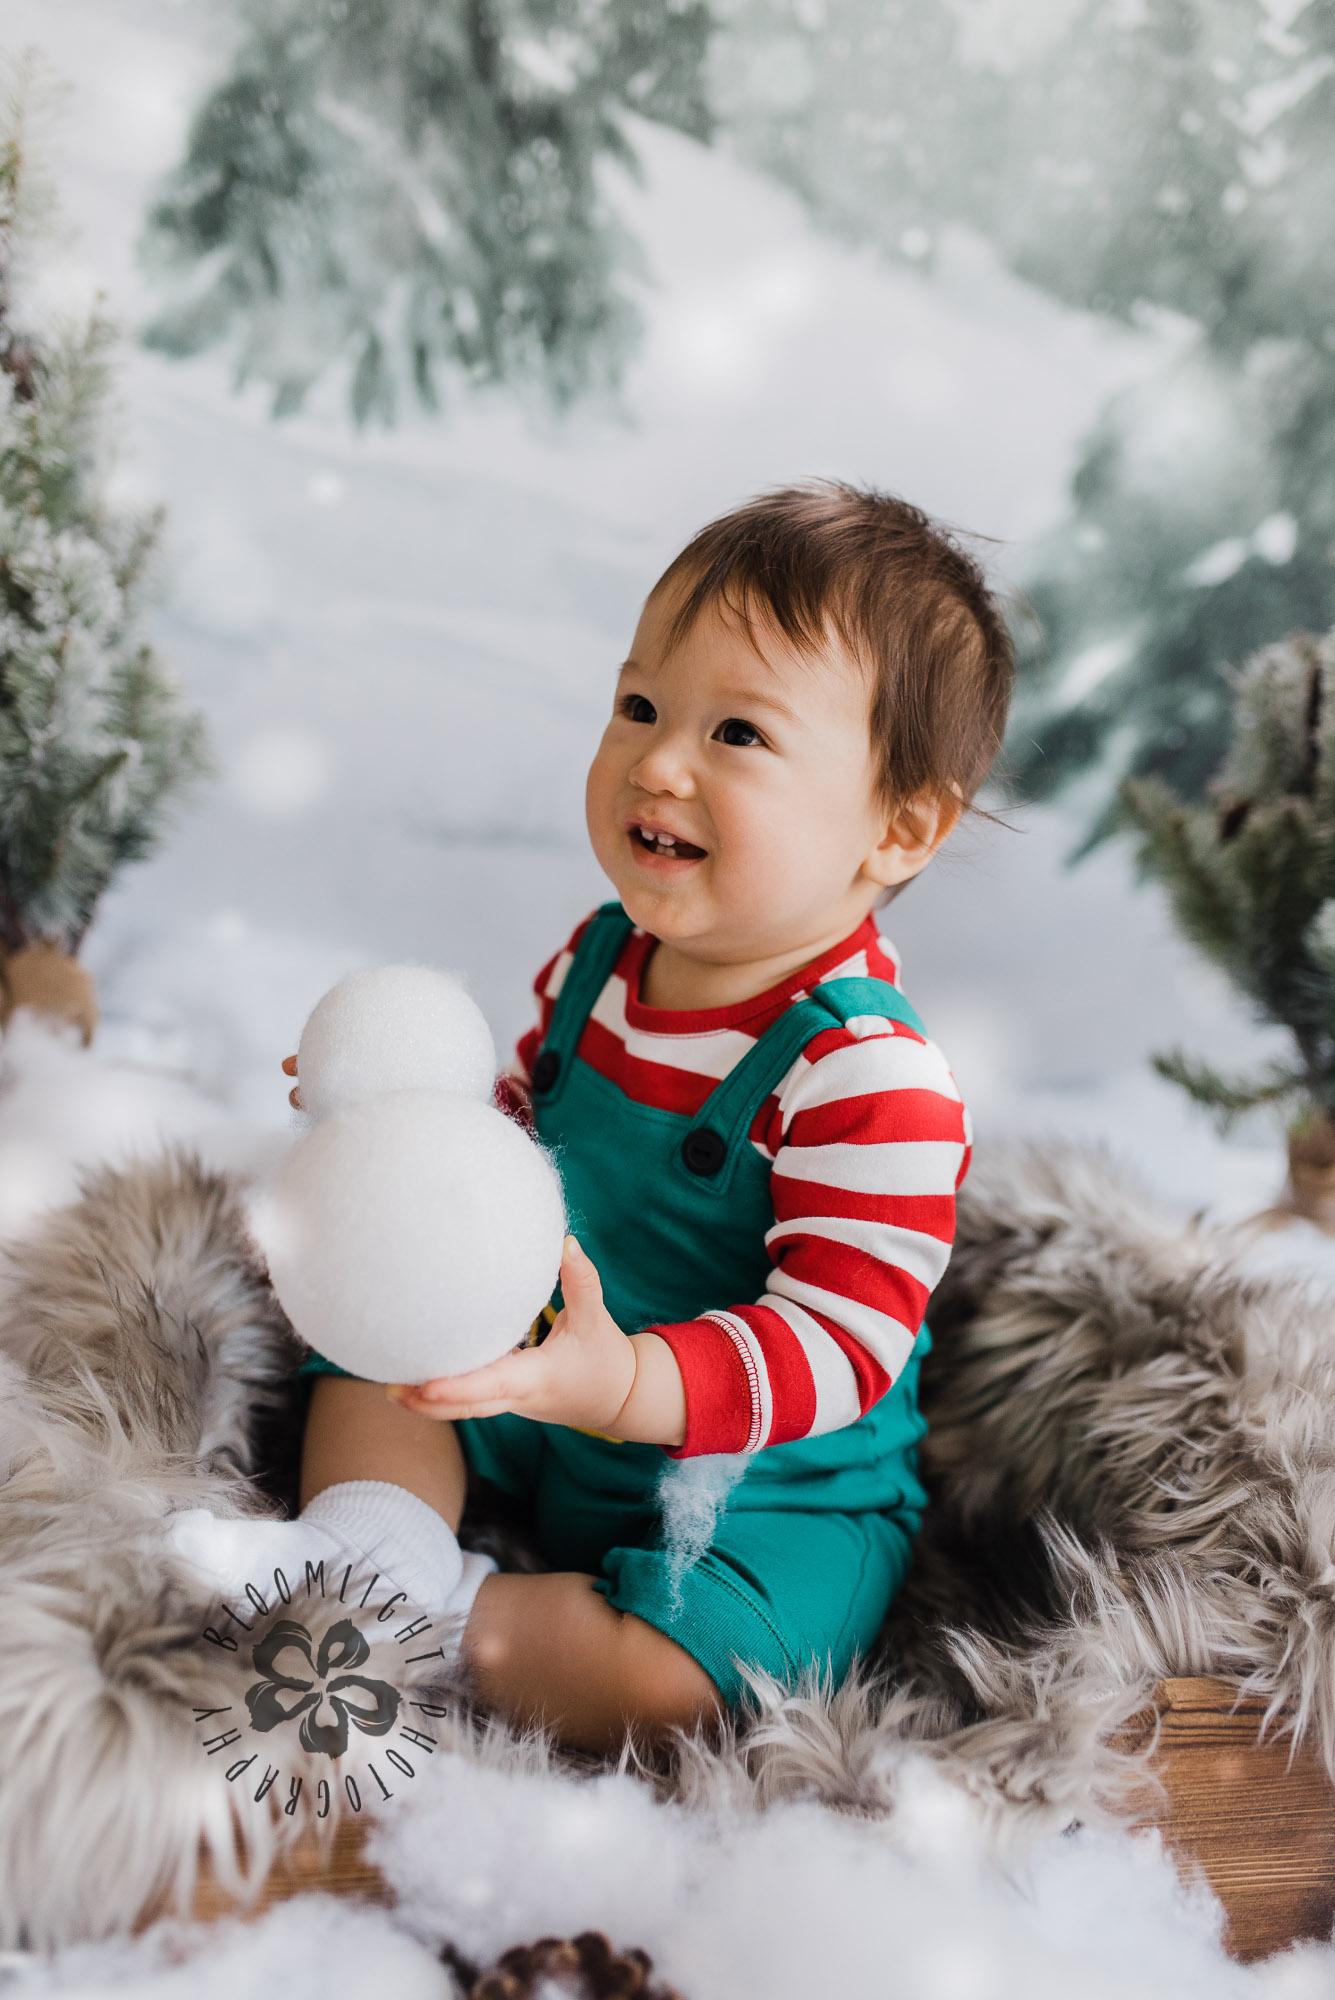 Toronto-NorthYork-Christmas-Minis-Holiday-Photographer-baby-children-kid-photo (24).jpg